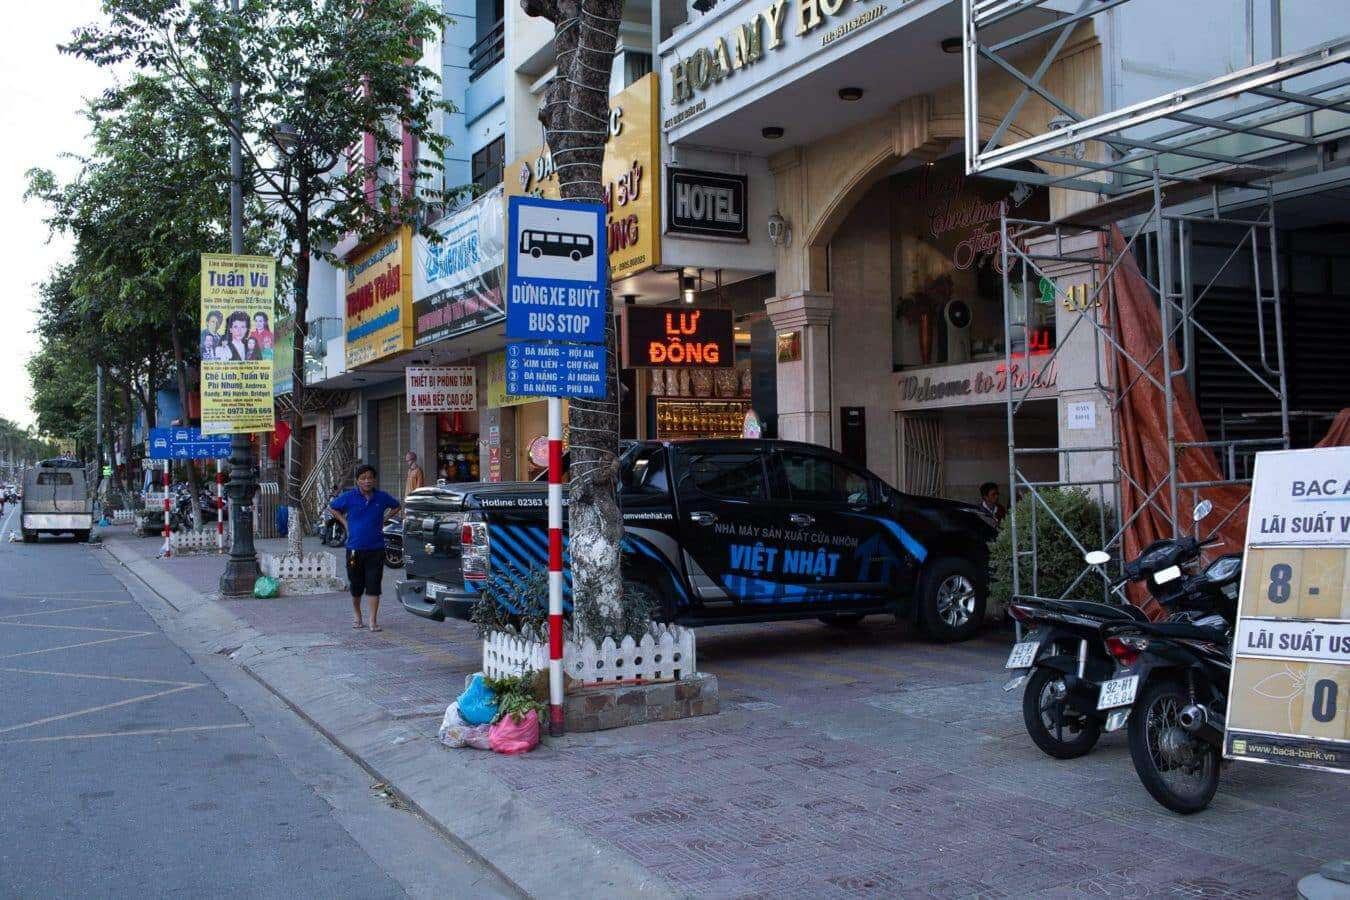 Bus stop for the No. 1 bus - Da Nang to Hoi An